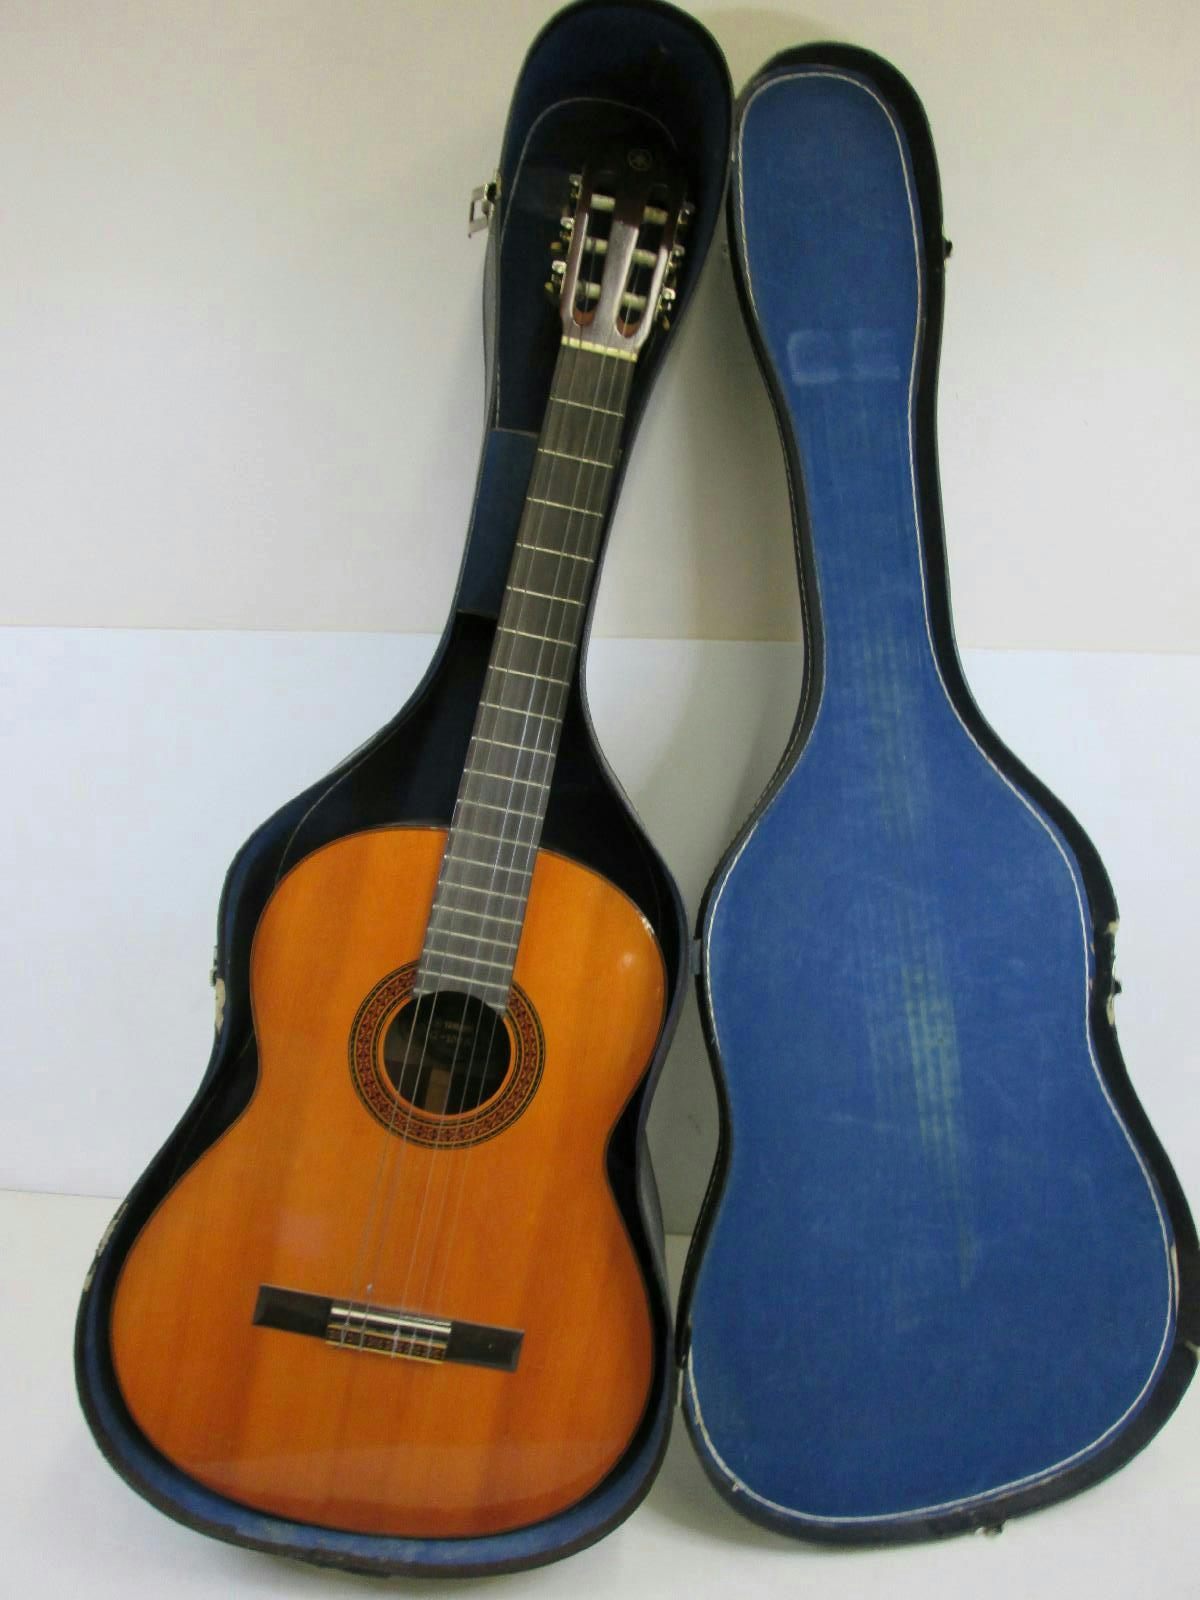 yamaha g100a classical acoustic guitar in hard case ebay. Black Bedroom Furniture Sets. Home Design Ideas